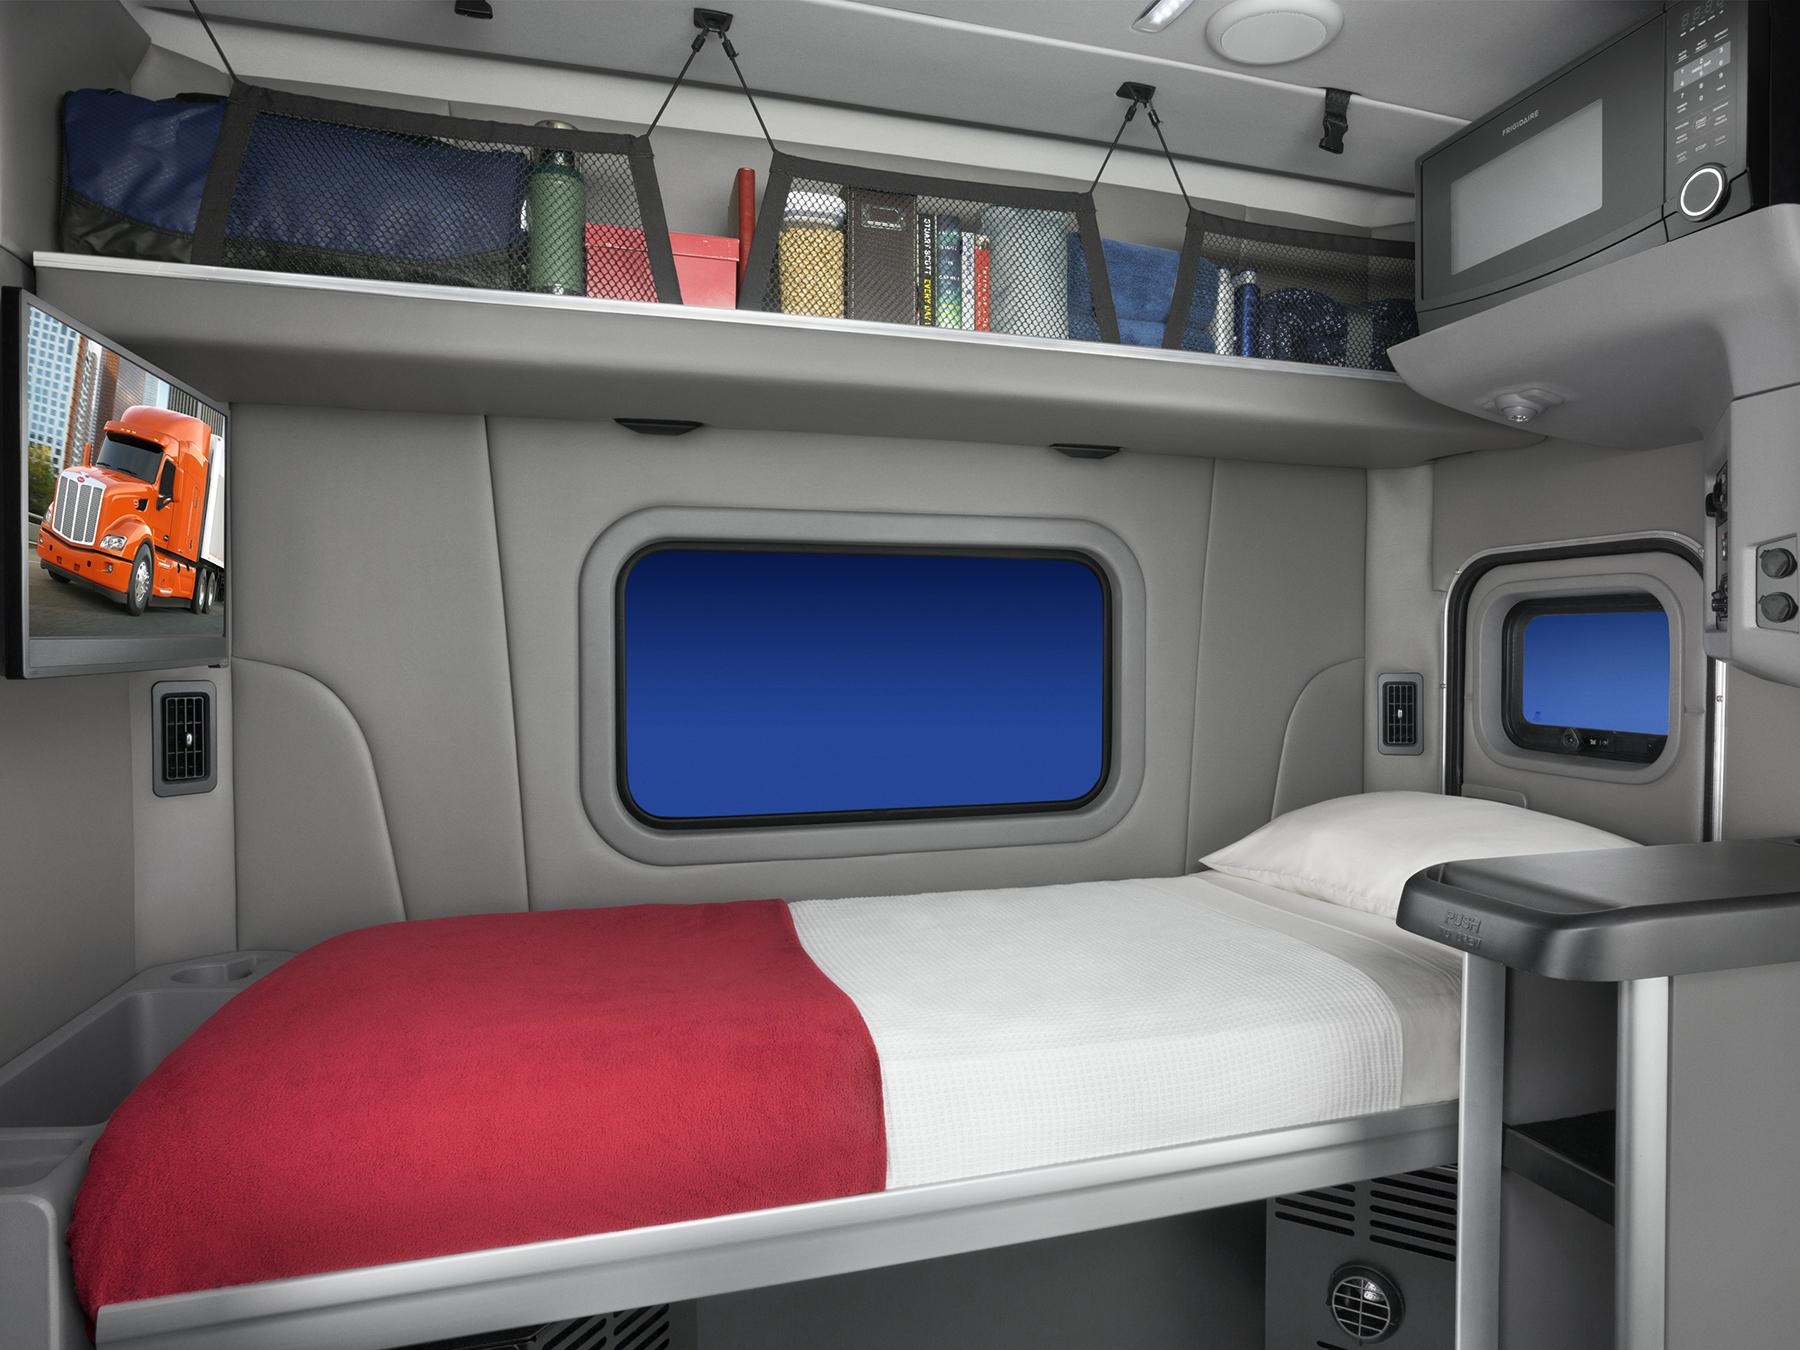 Peterbilt To Soon Release 58 Inch Sleeper Truck News